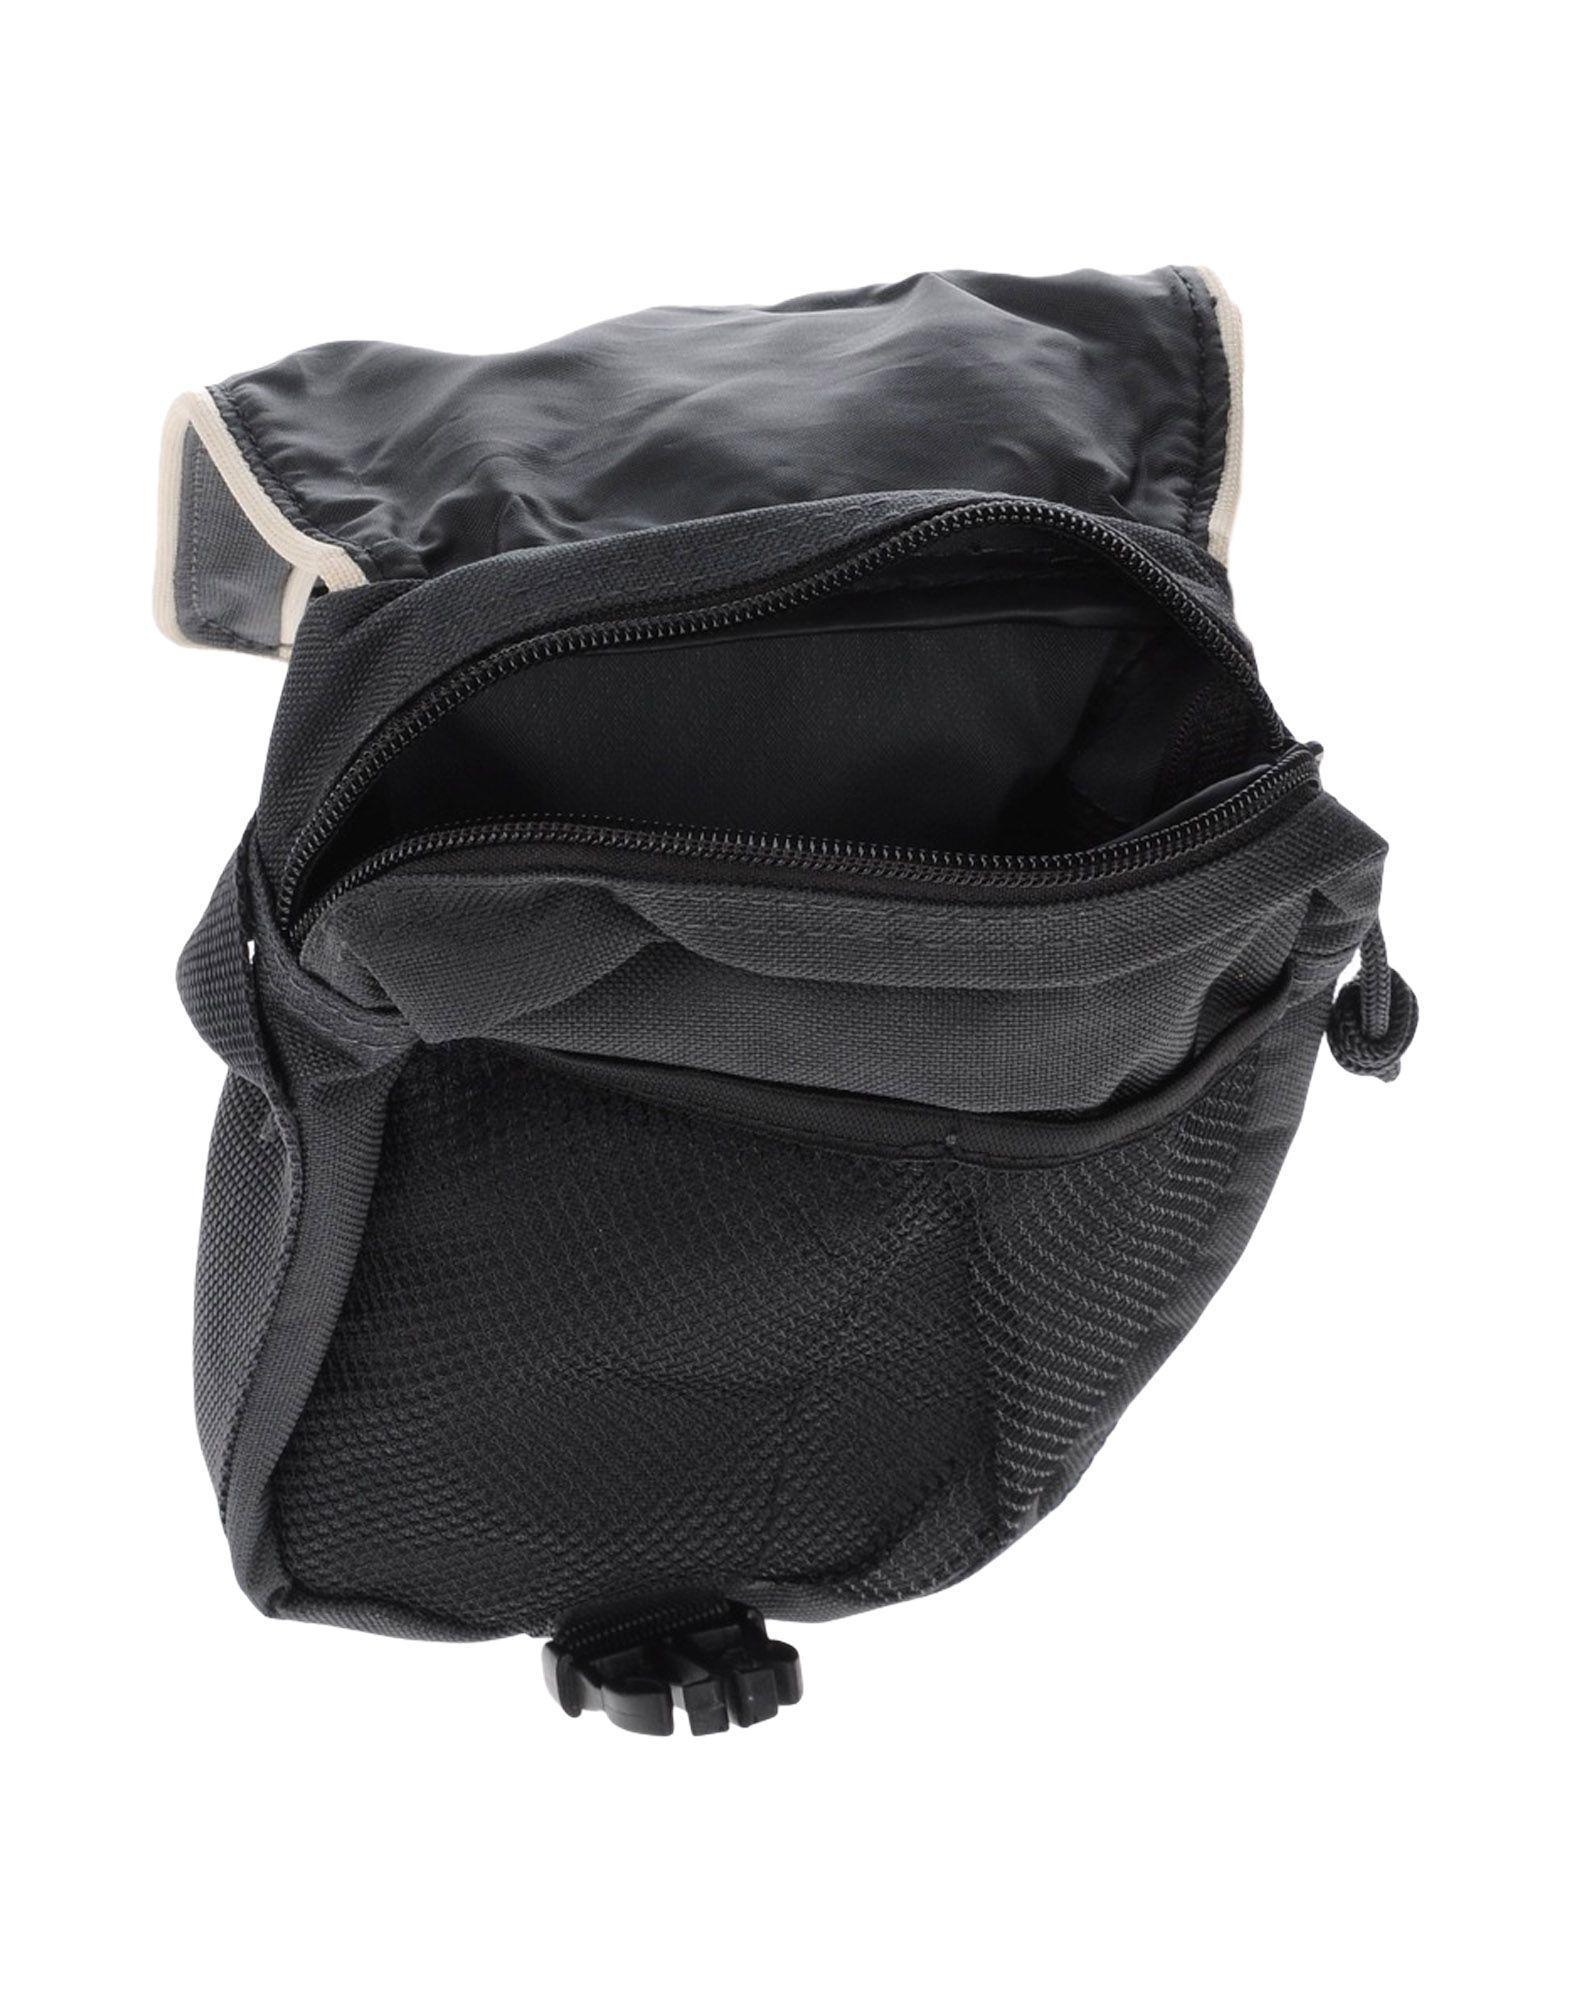 Lotto Leggenda Synthetic Cross-body Bag in Grey (Grey) for Men